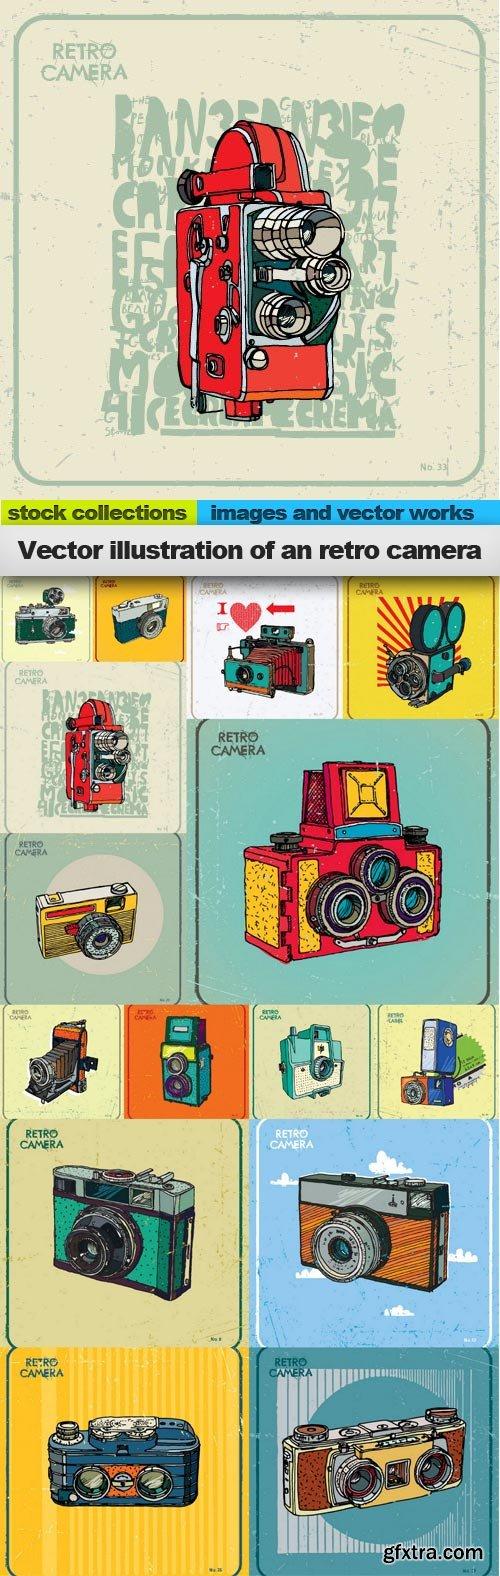 Vector illustration of an retro camera, 15 x EPS